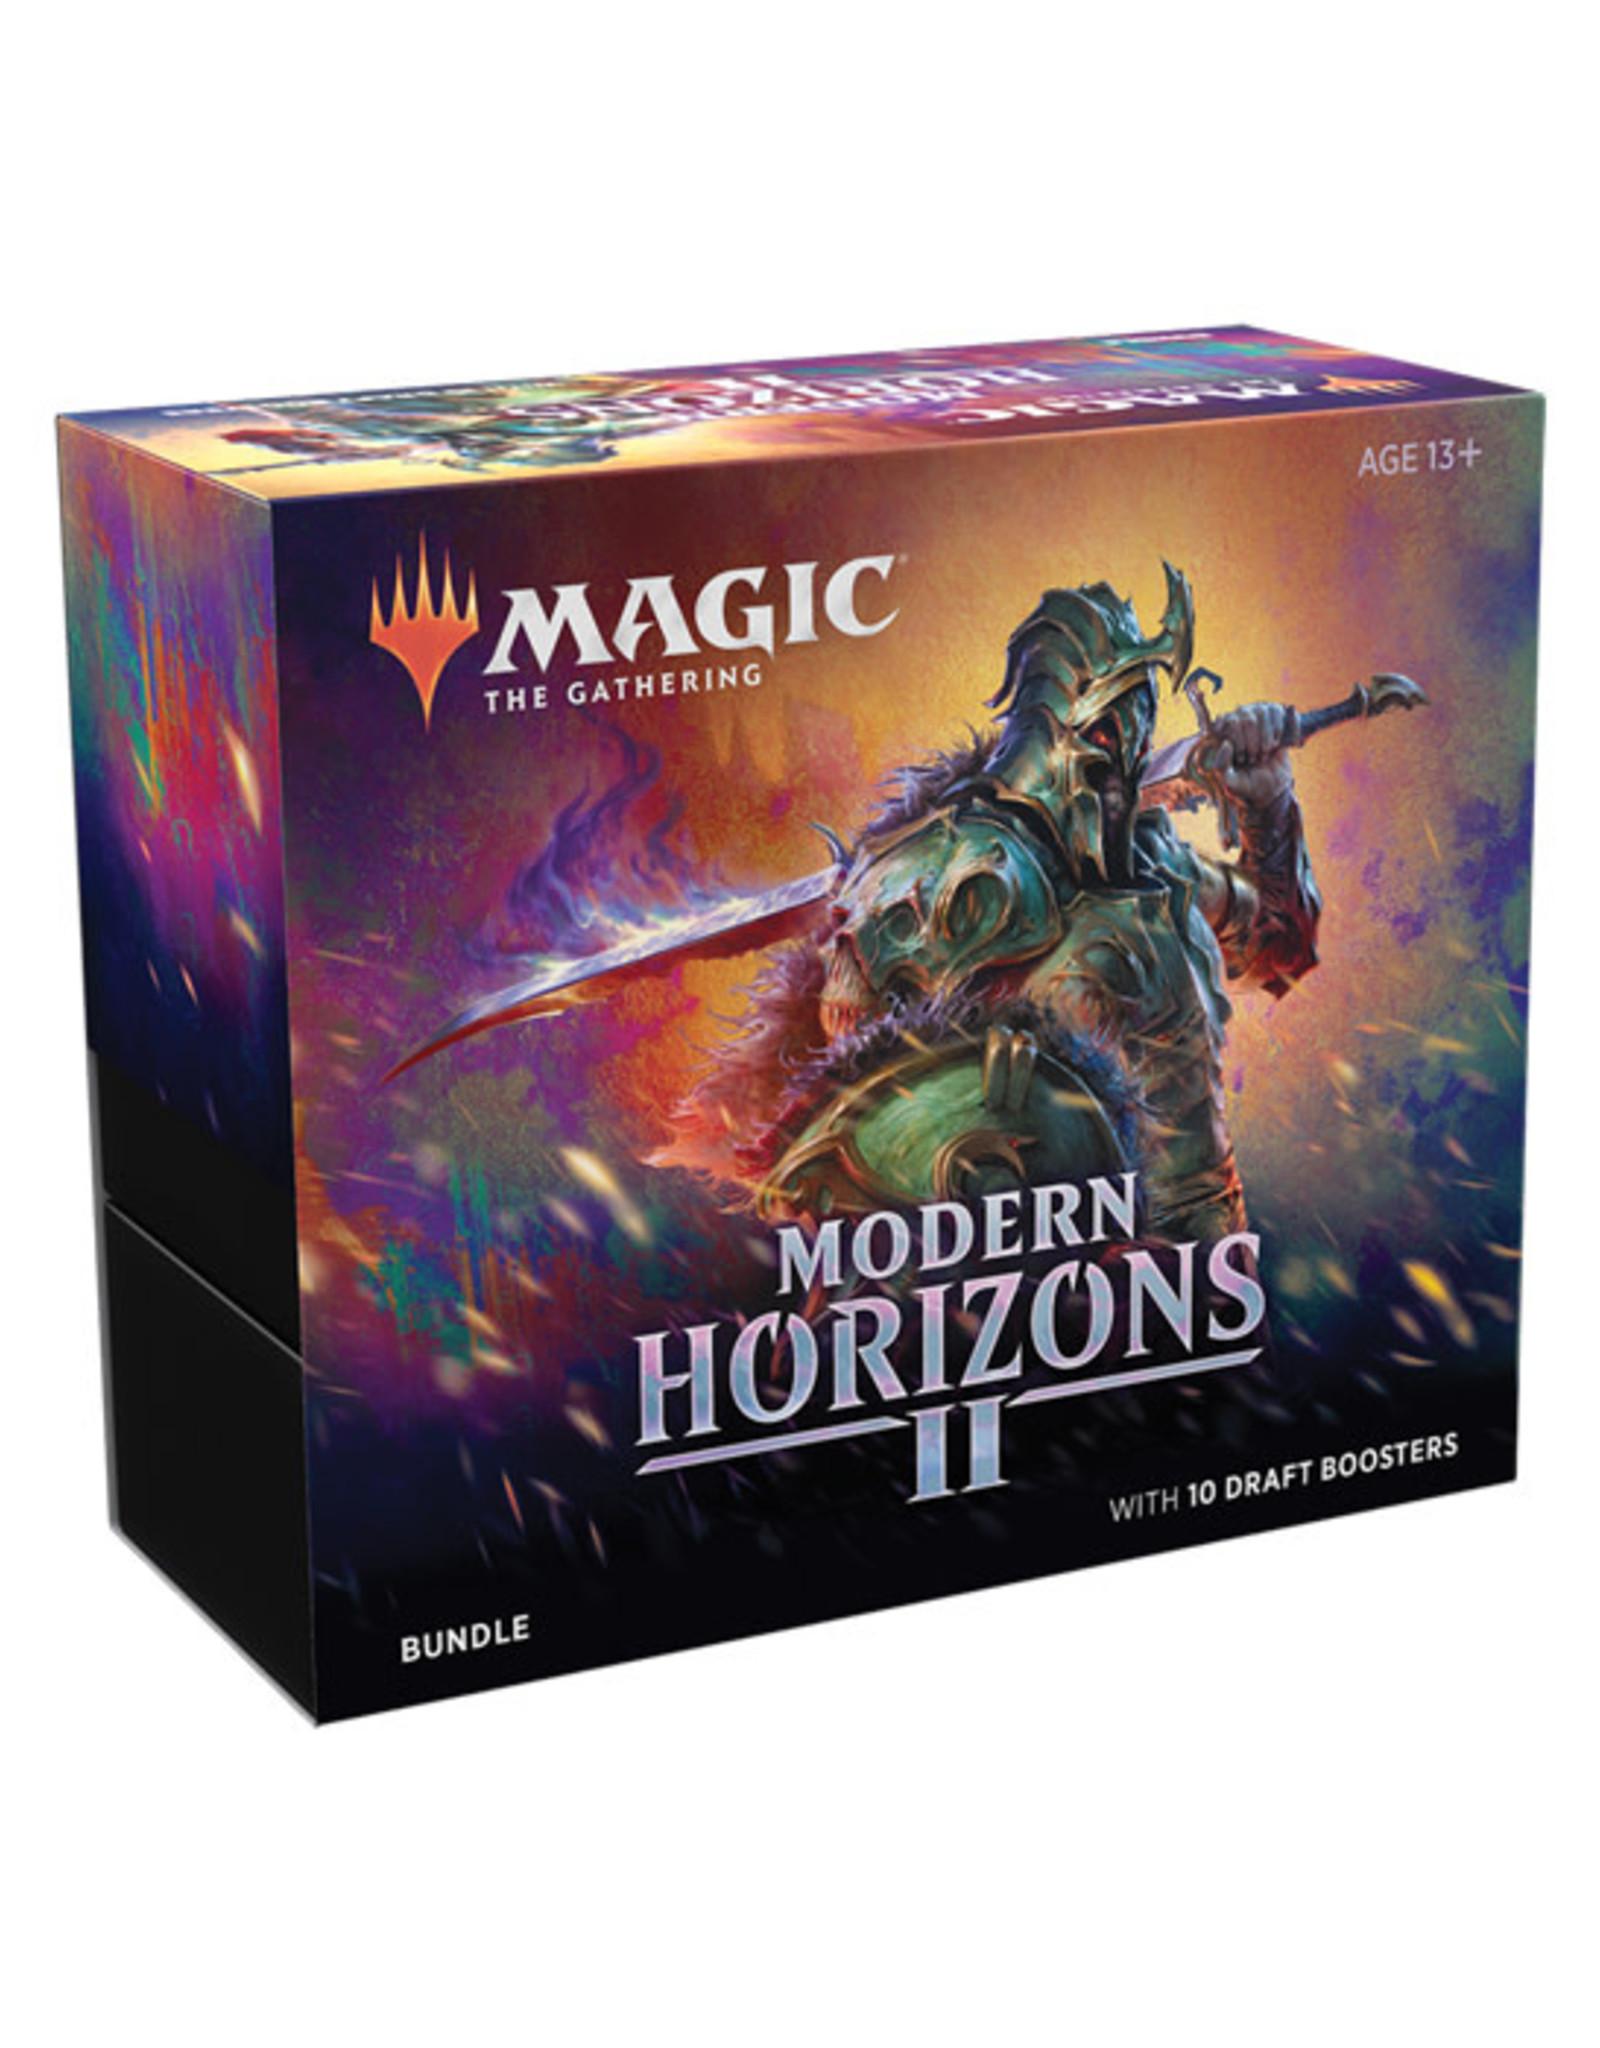 Magic: The Gathering Magic: The Gathering - Modern Horizons 2 - Prerelease Pack